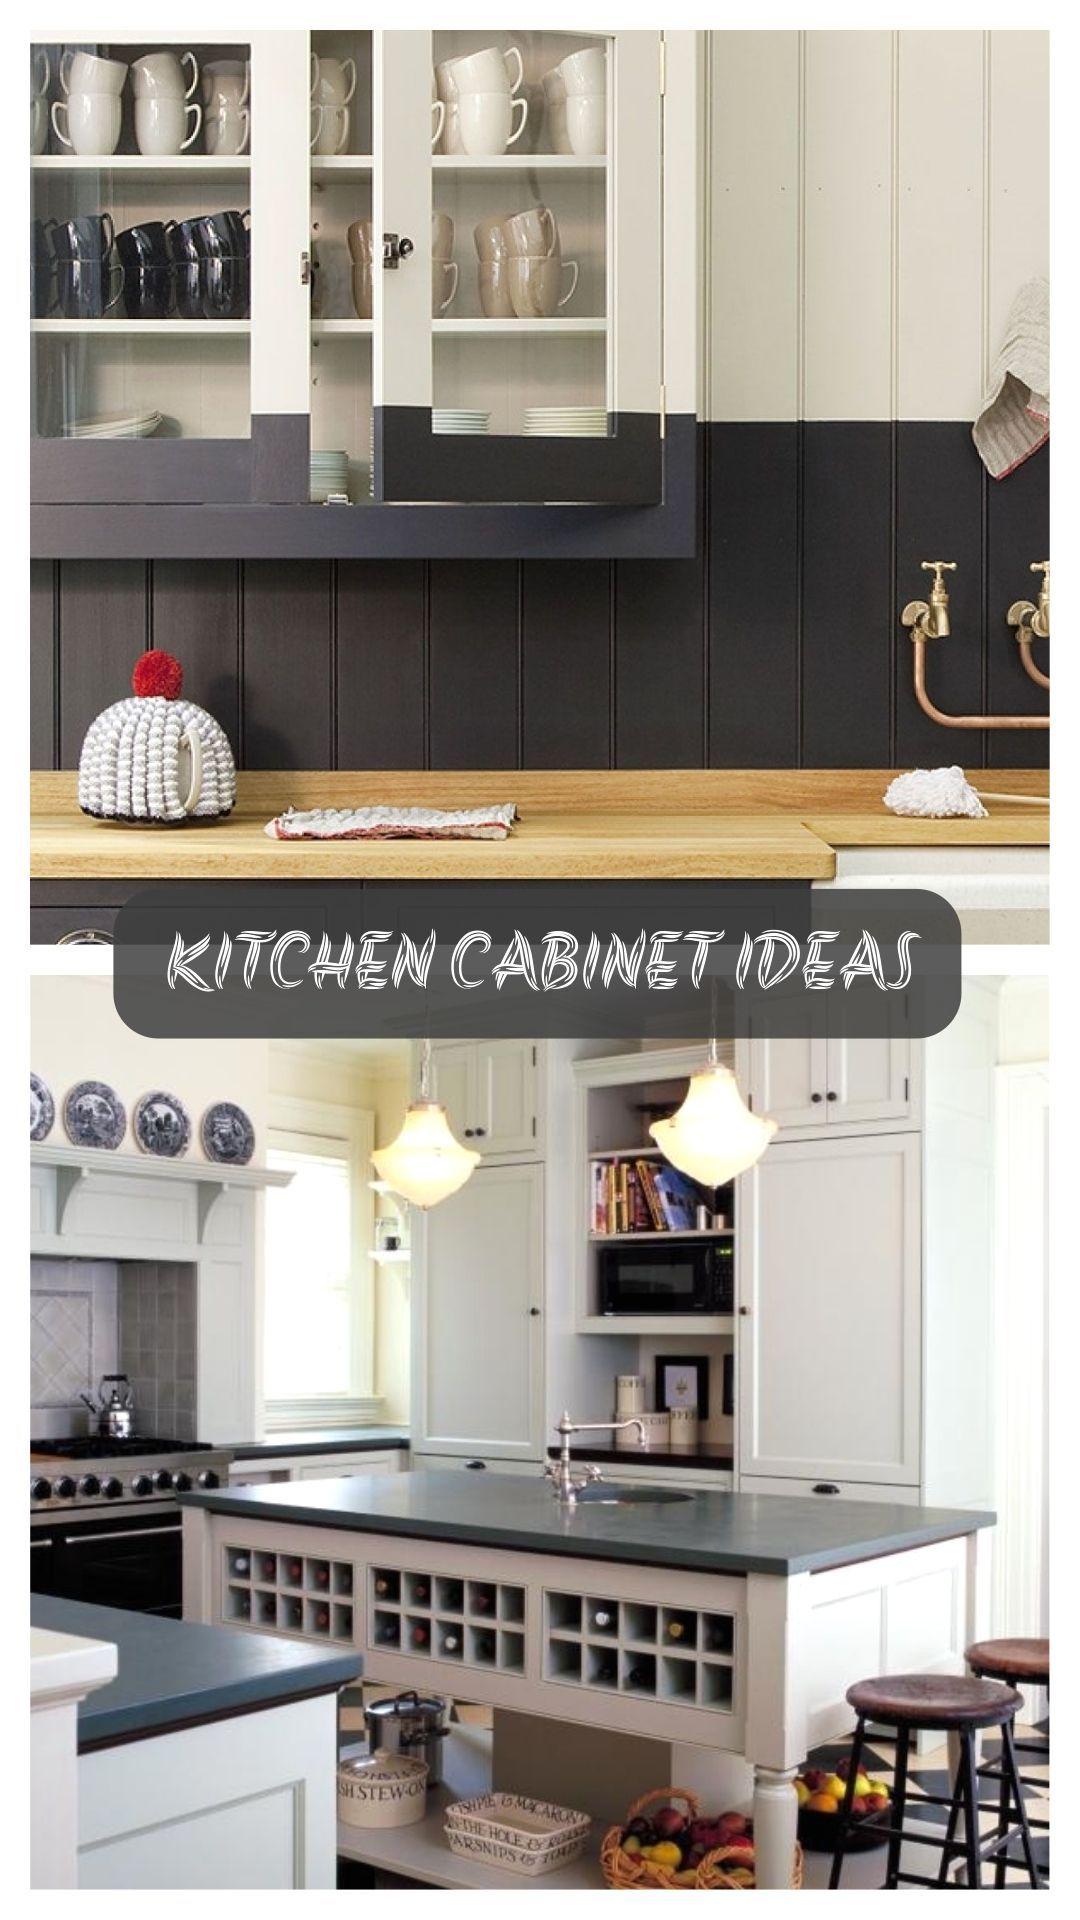 Kitchen Decor Ideas Mason Jar Kitchen Decor Kitchen Decor Yellow Kitchen Decor Signs Halloween In 2020 Diy Kitchen Kitchen Decor Modern Kitchen Backsplash Designs